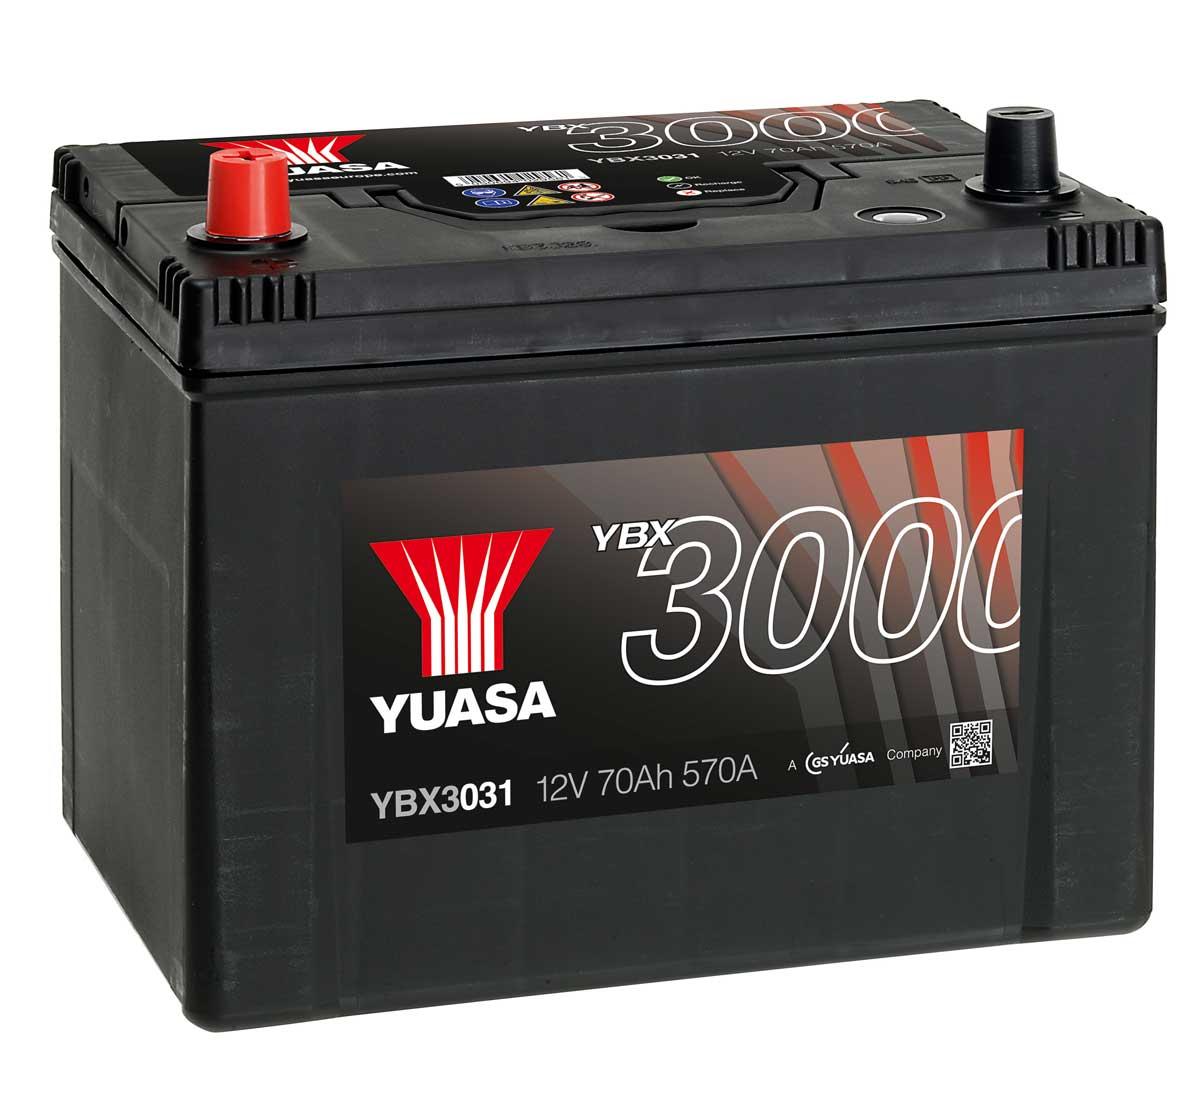 yuasa ybx3031 12v car battery mds battery. Black Bedroom Furniture Sets. Home Design Ideas